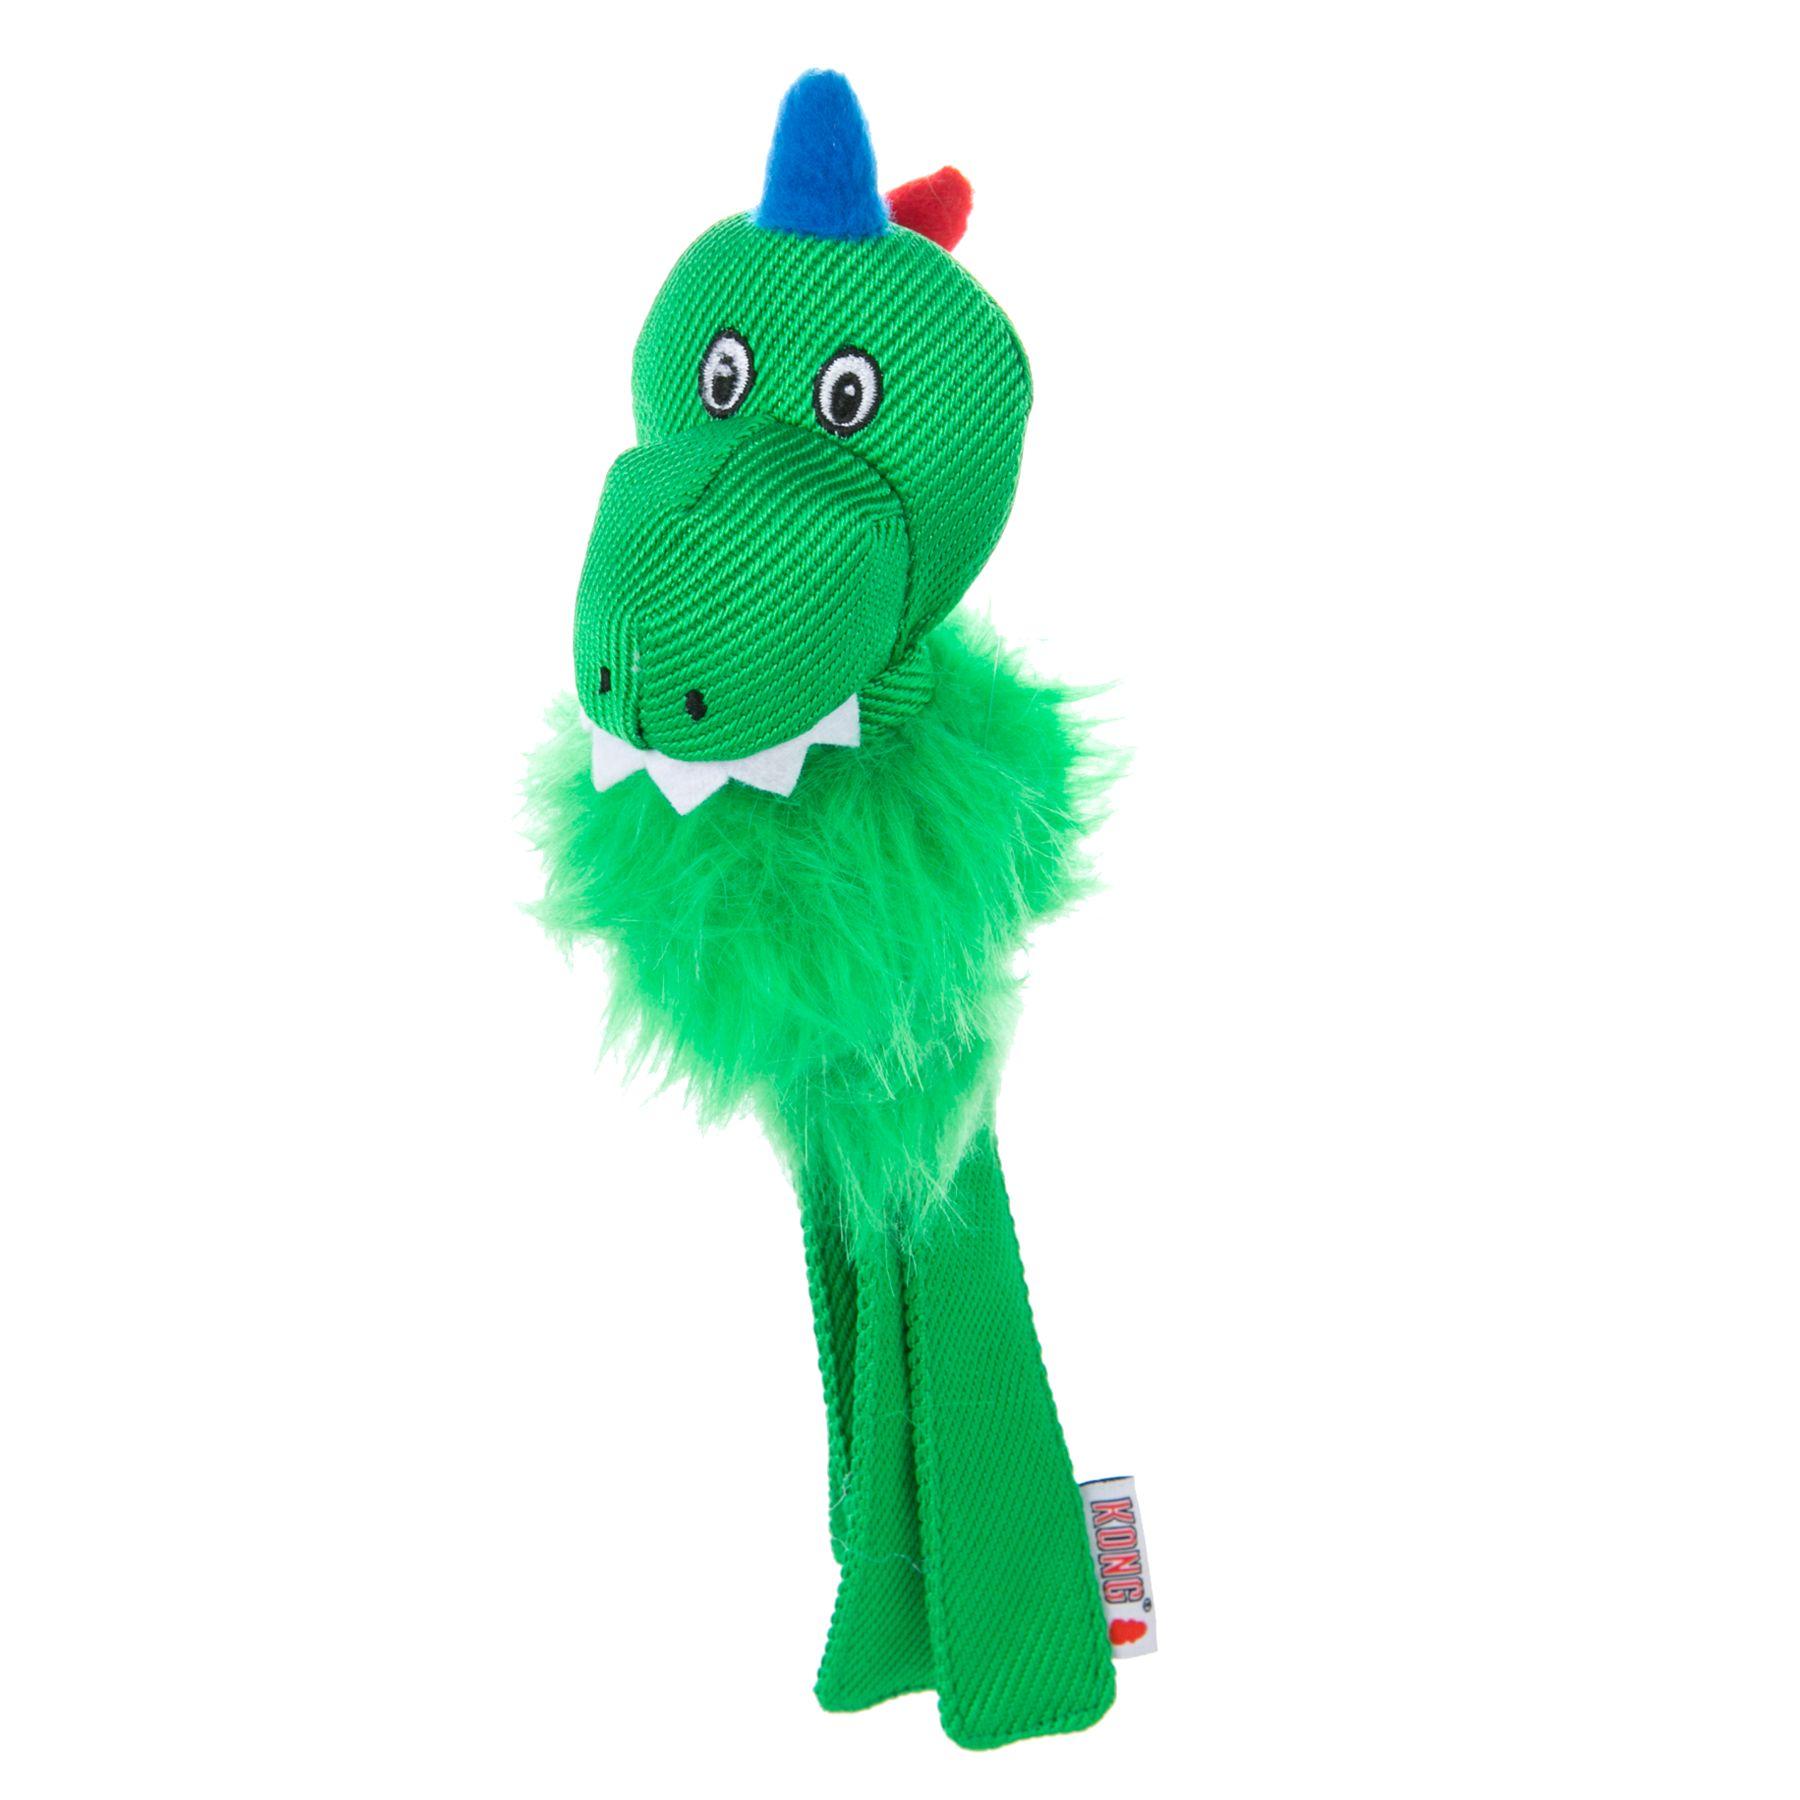 Kong® Wubba, Fuzzy T-Rex Dog Toy - Squeaker 5244791